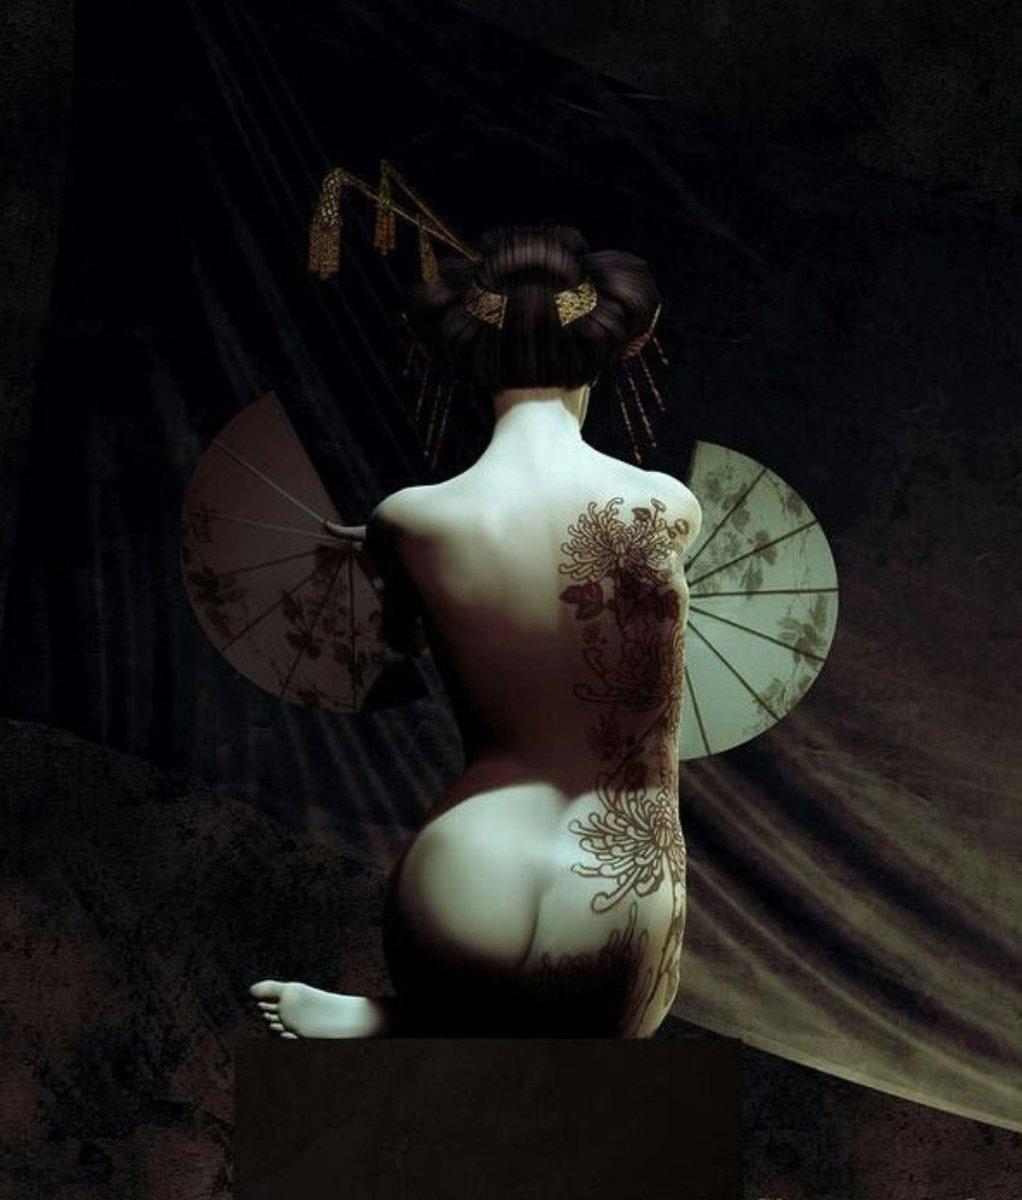 Adults Only Mature Content Courtesan Geisha Art Japanese